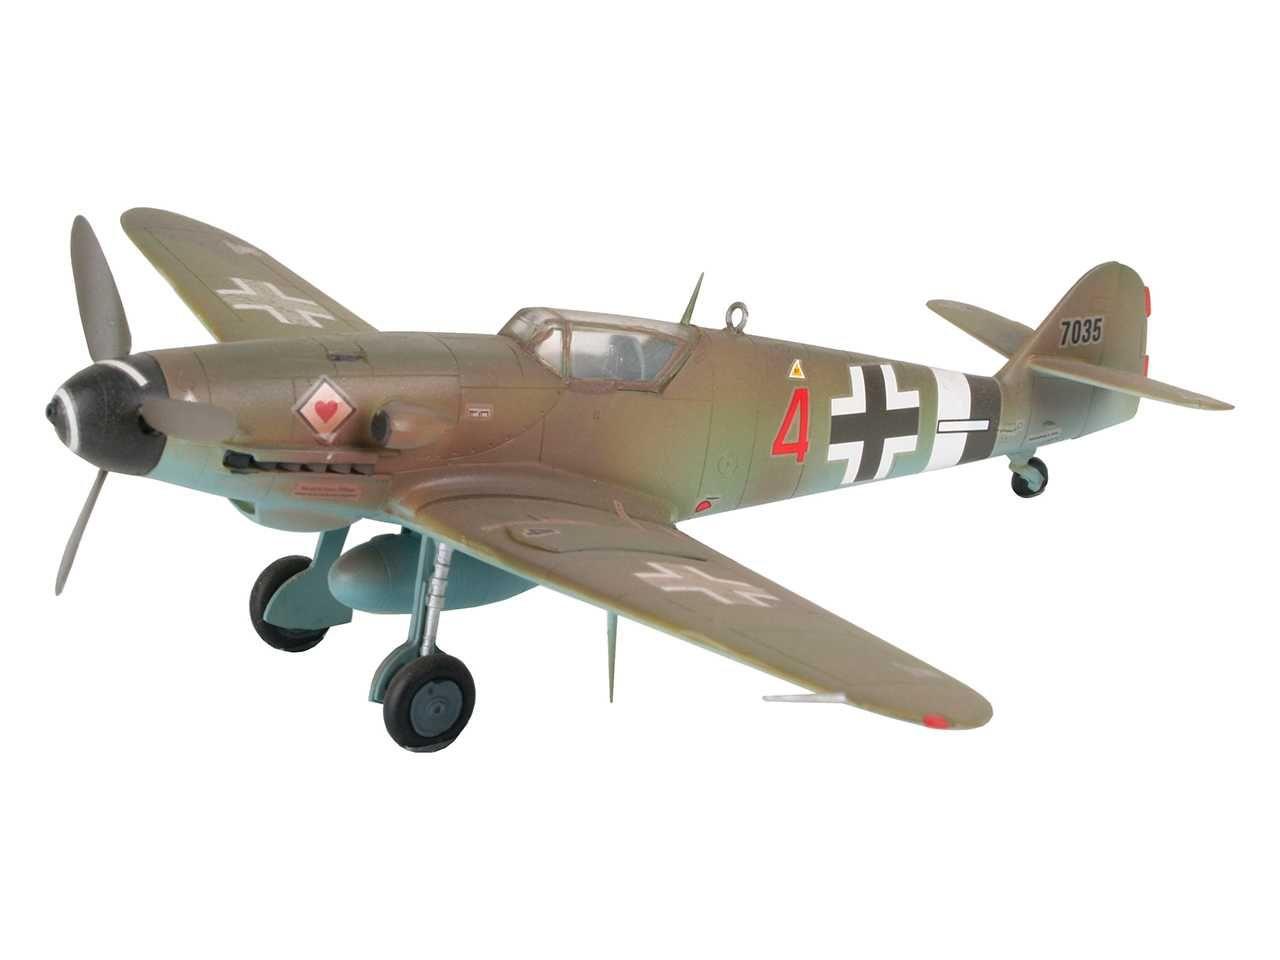 ModelSet letadlo 64160 - Messerschmitt Bf 109 G-10 (1:72) Plastikové modely